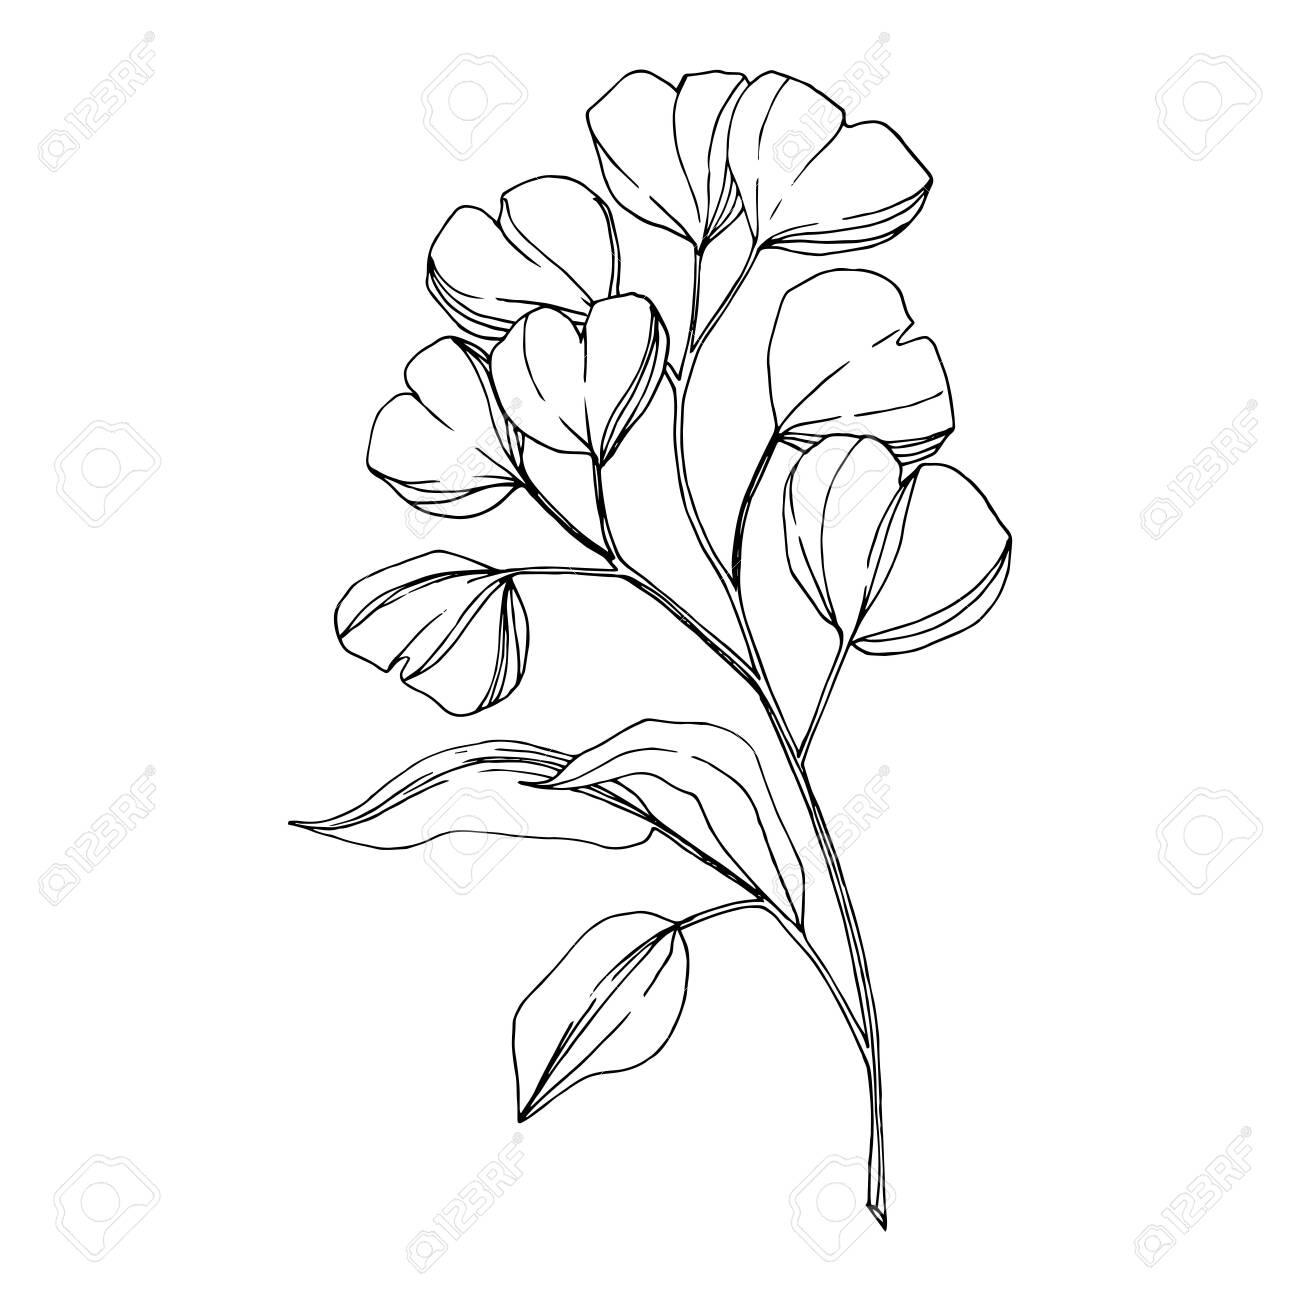 Vector Eucalyptus branch. Black and white engraved ink art. Isolated eucaliptus illustration element. - 134267800